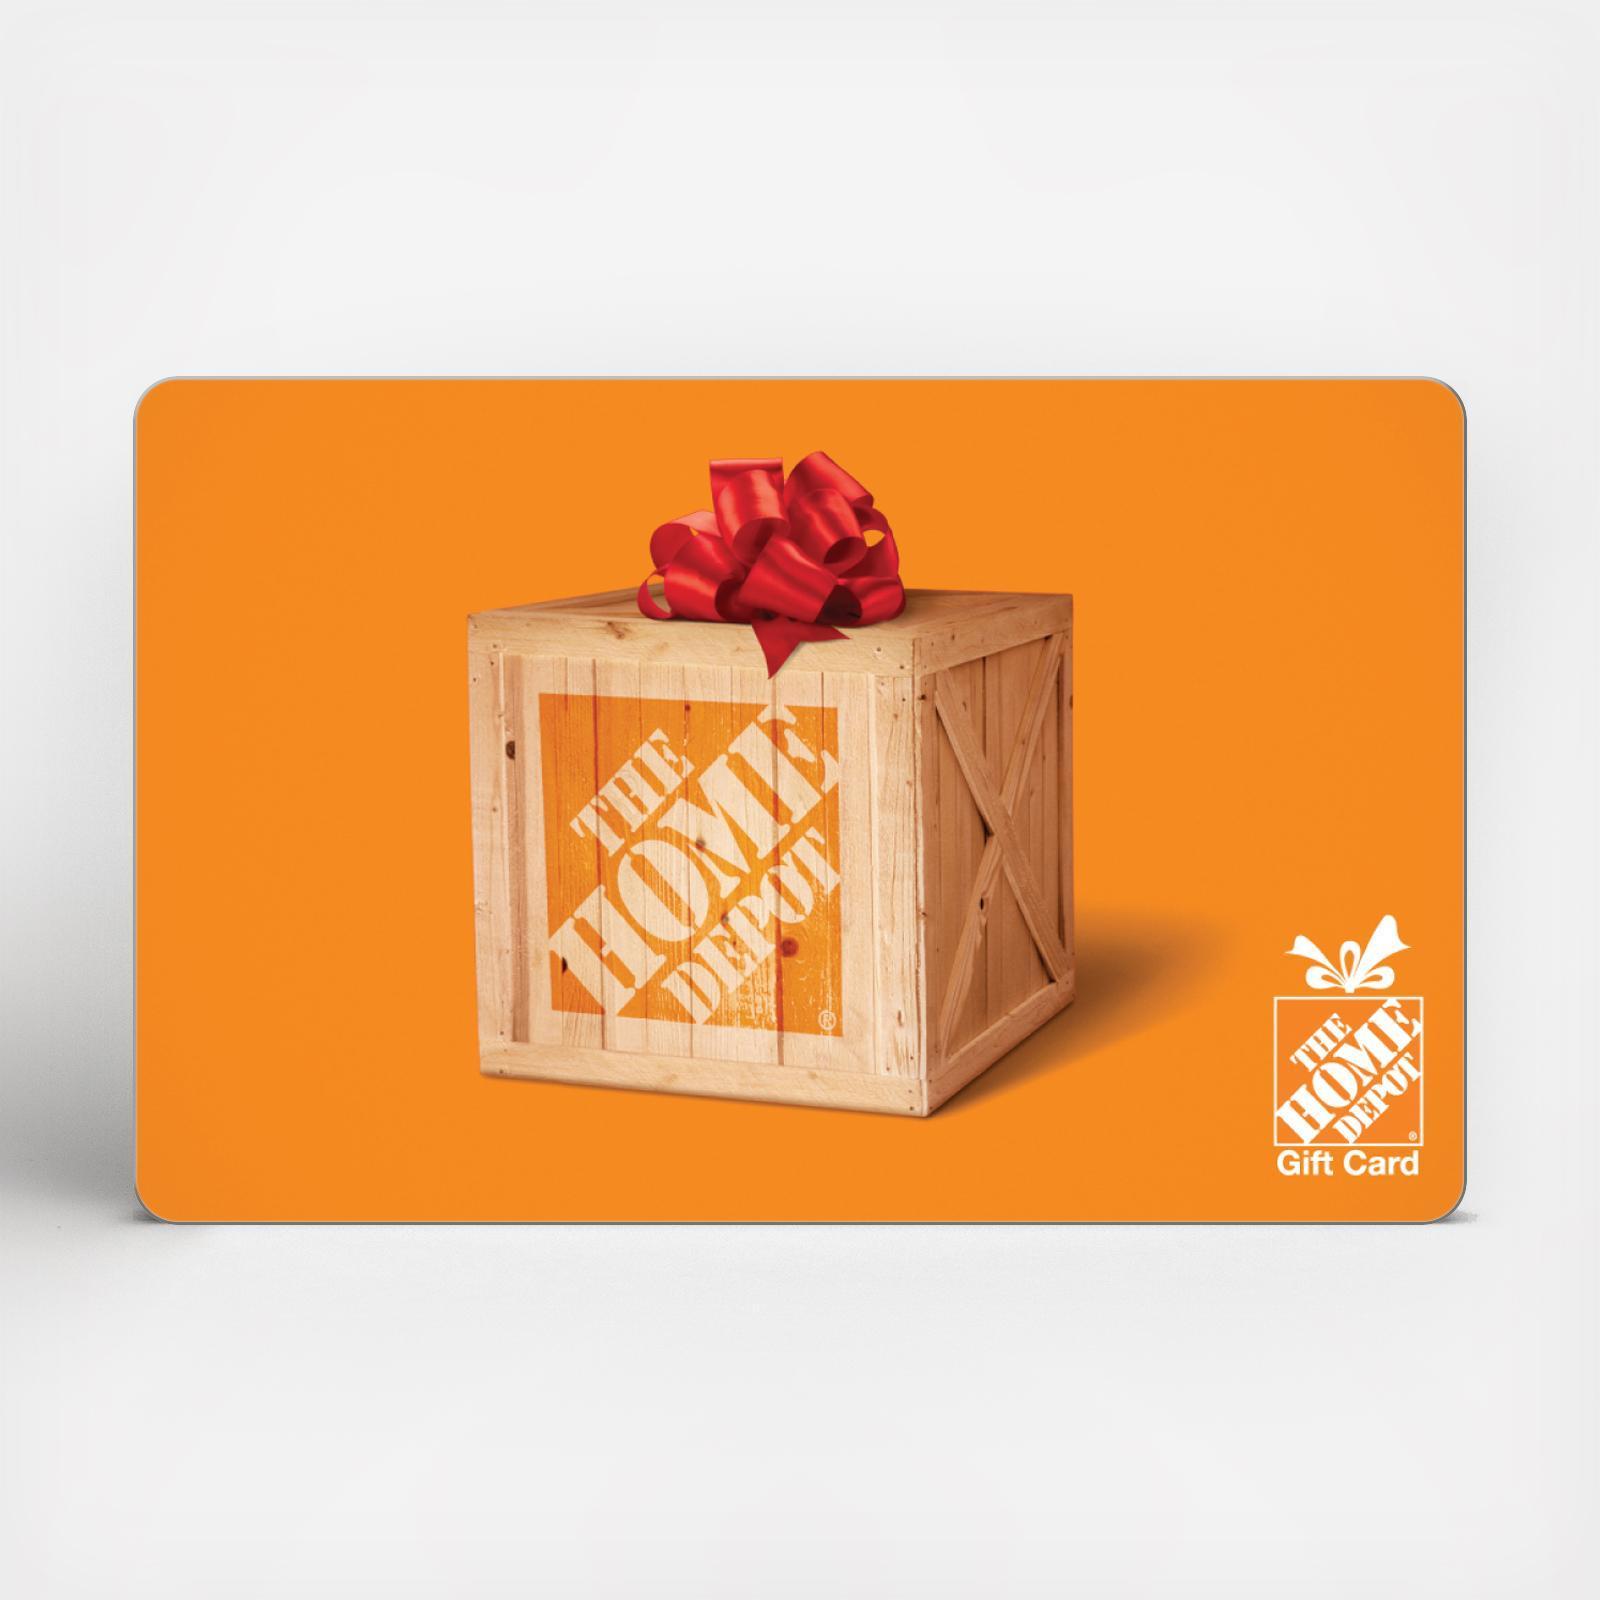 Home Depot Wedding Registry.Home Depot 100 Gift Card By The Home Depot Wedding Planning Registry Gifts